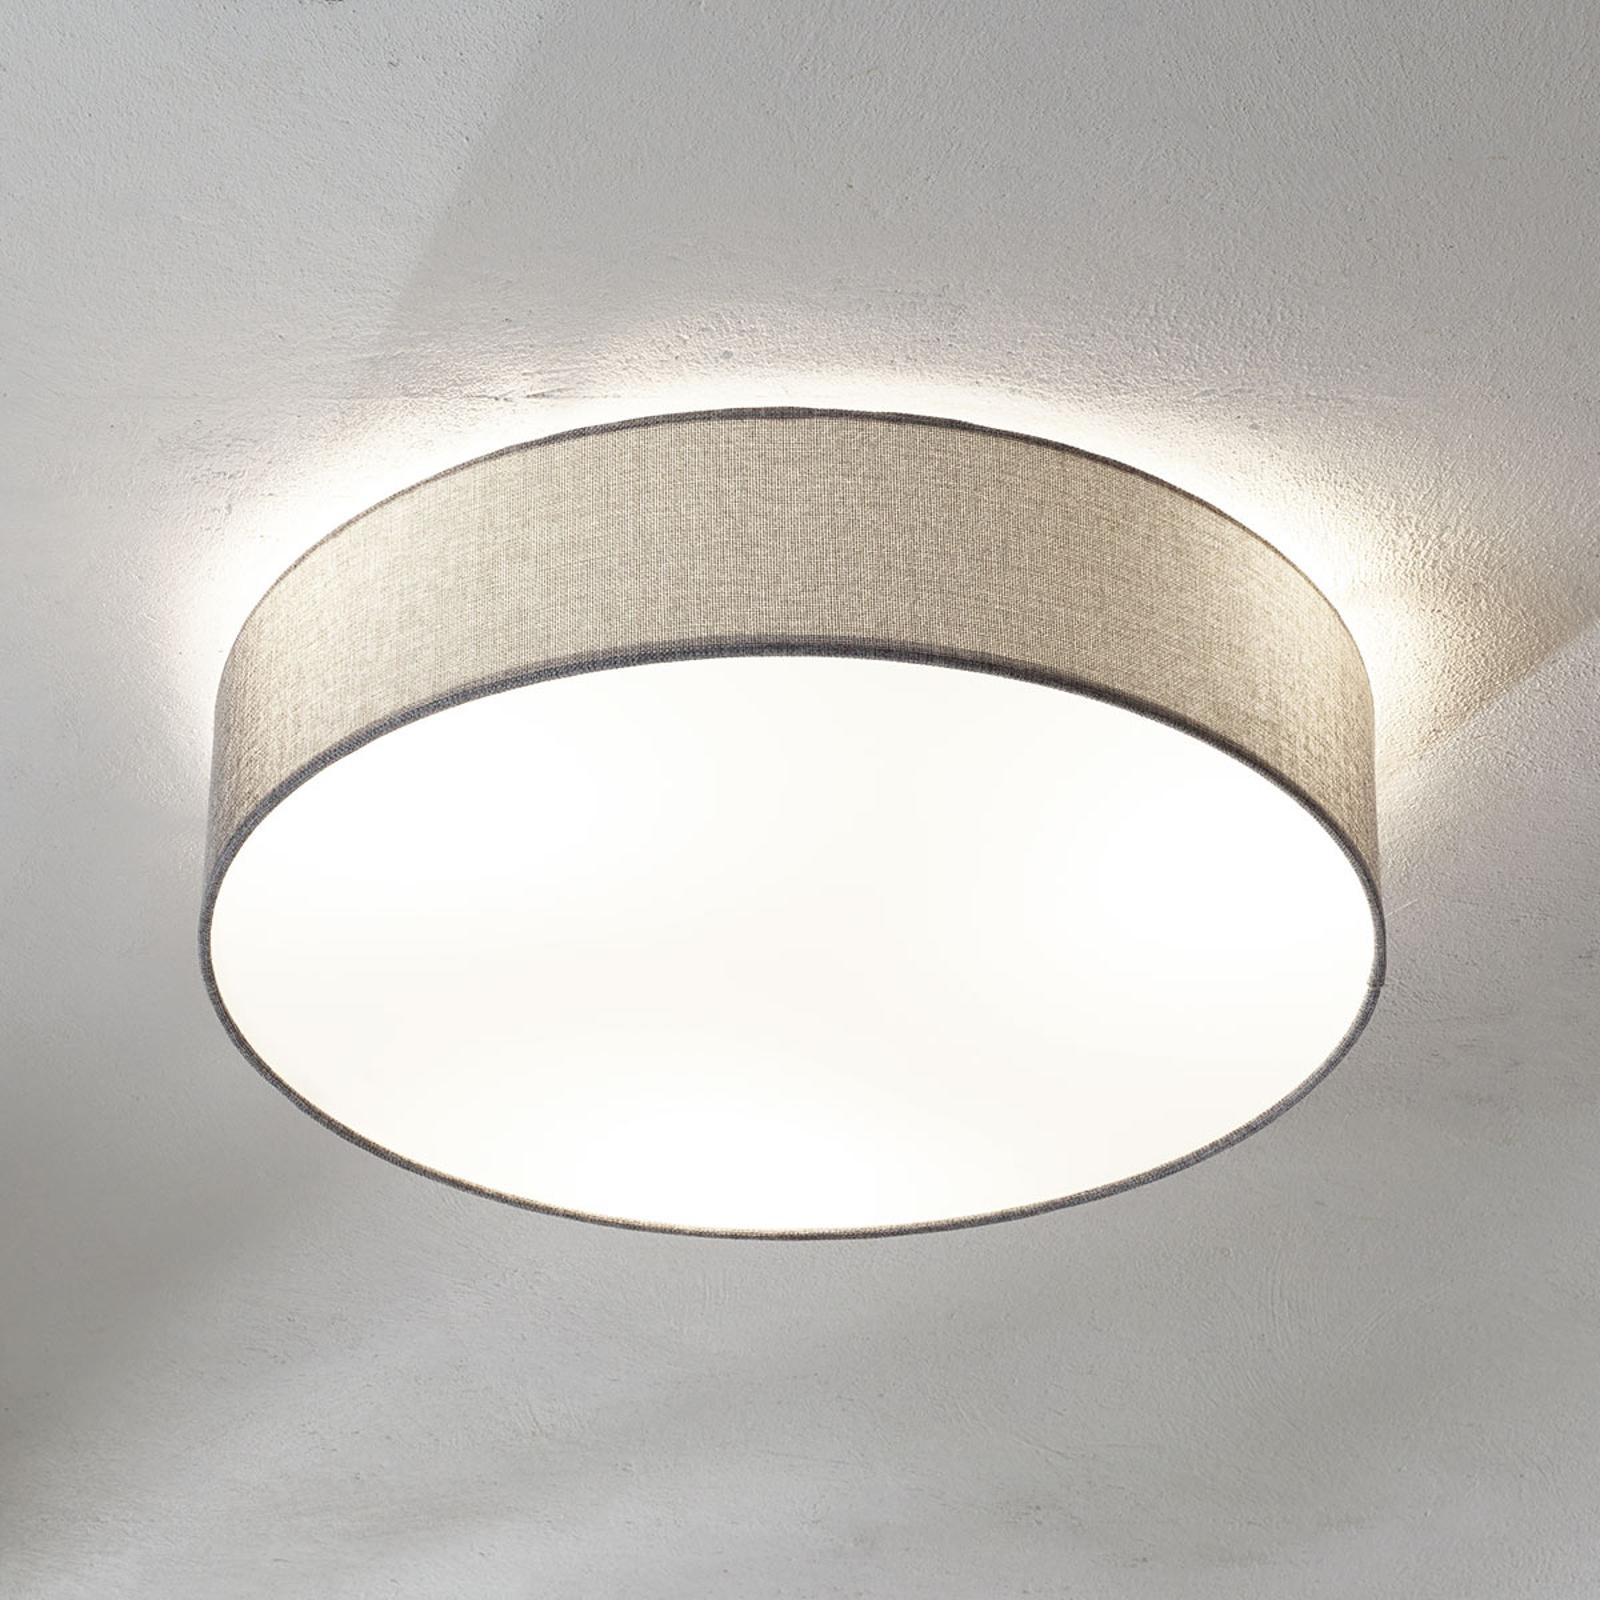 Szara lampa sufitowa Pasteri, lniany klosz, 57 cm